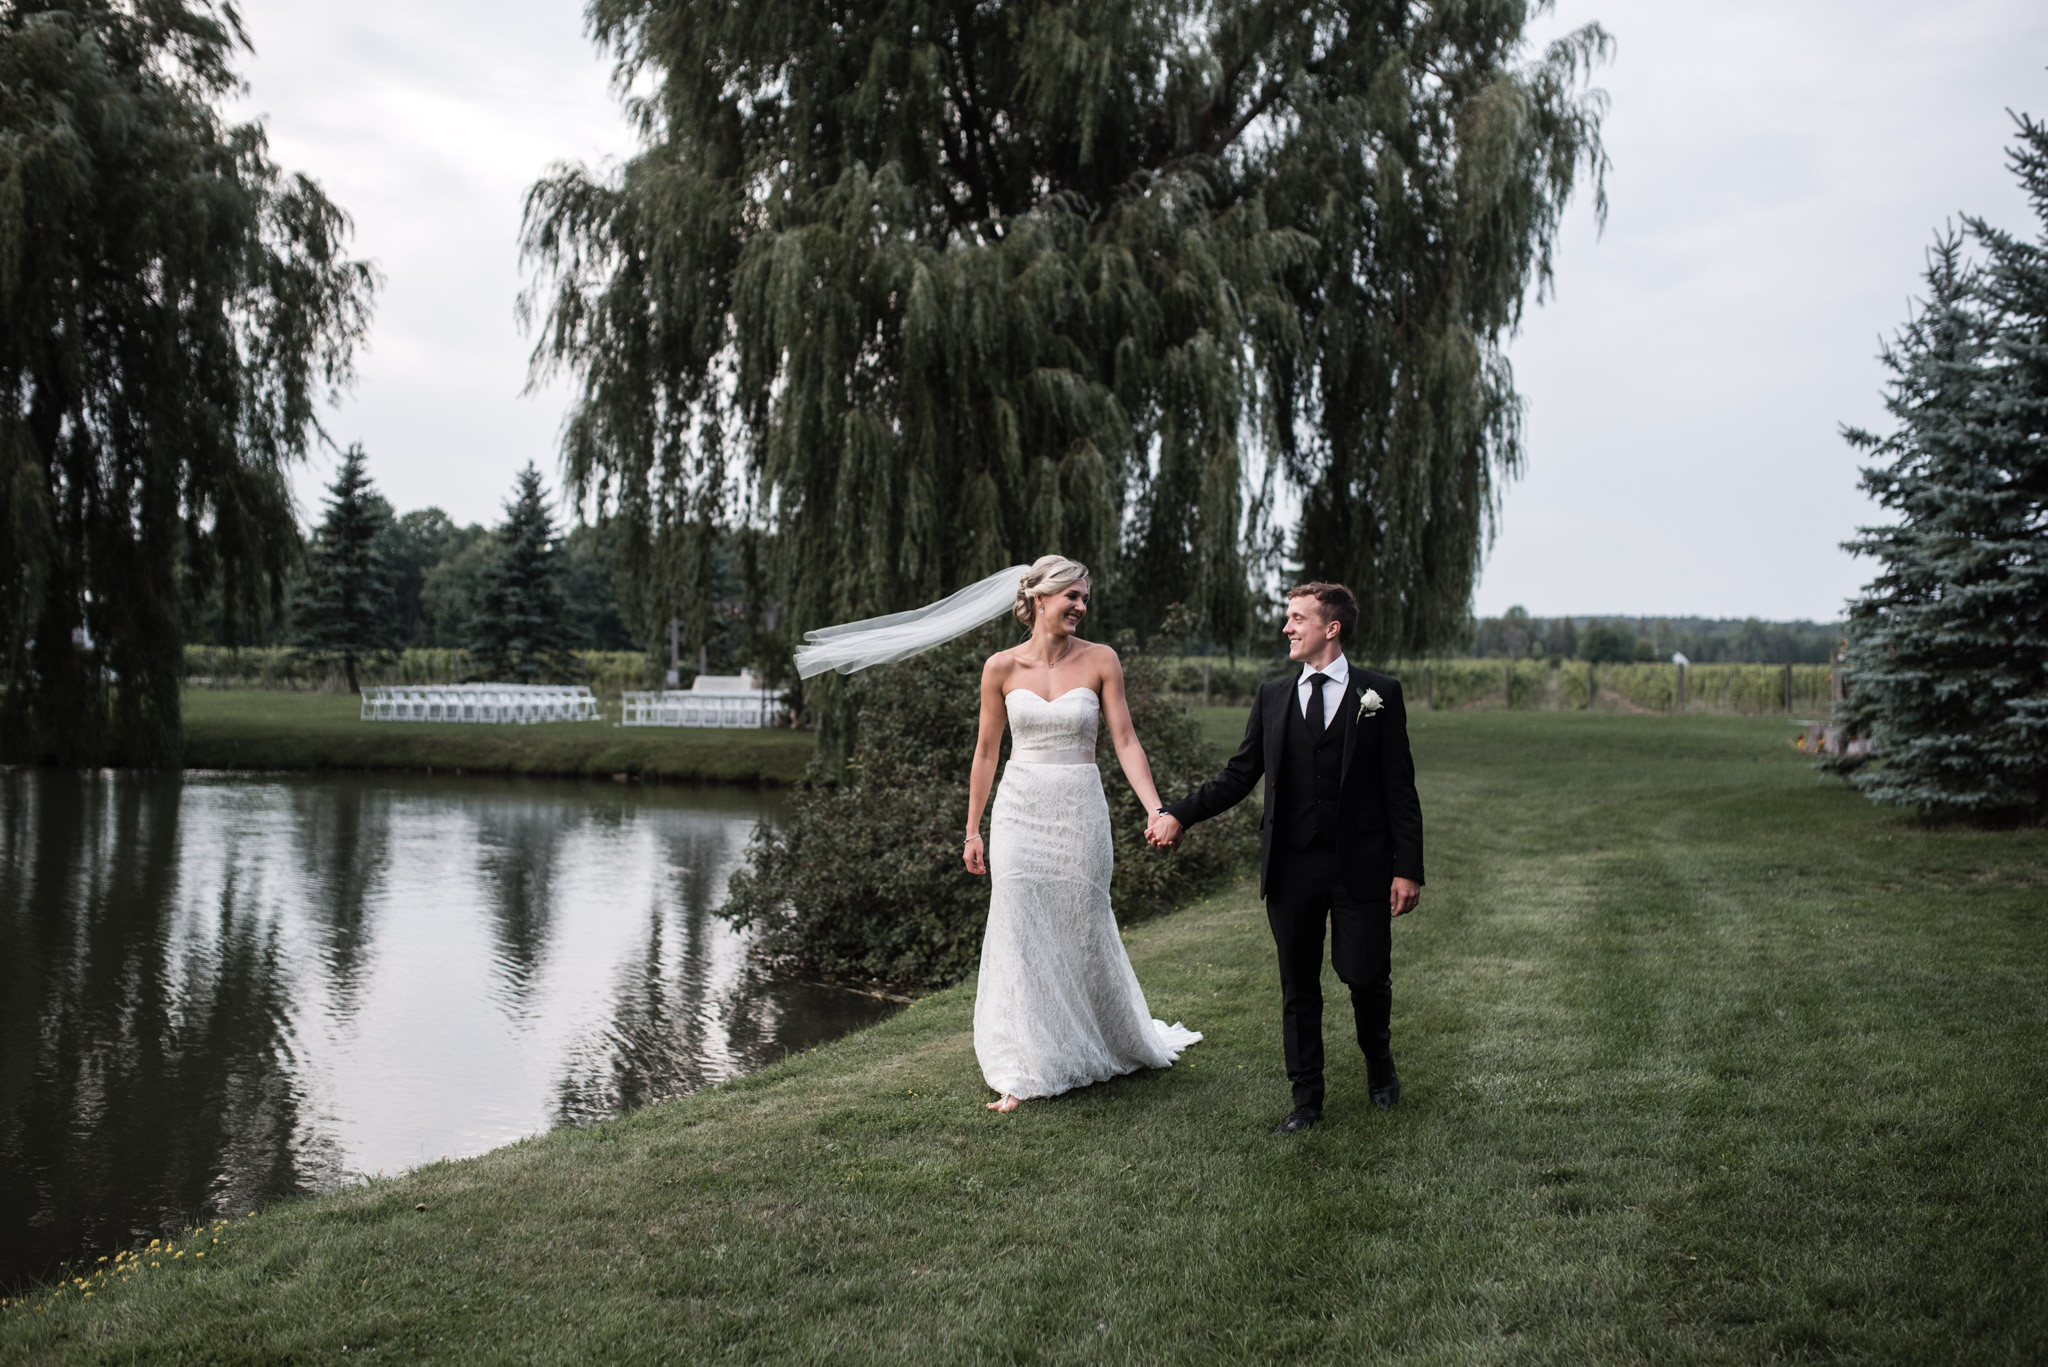 toronto-willow-spring-winery-wedding-photographer-64